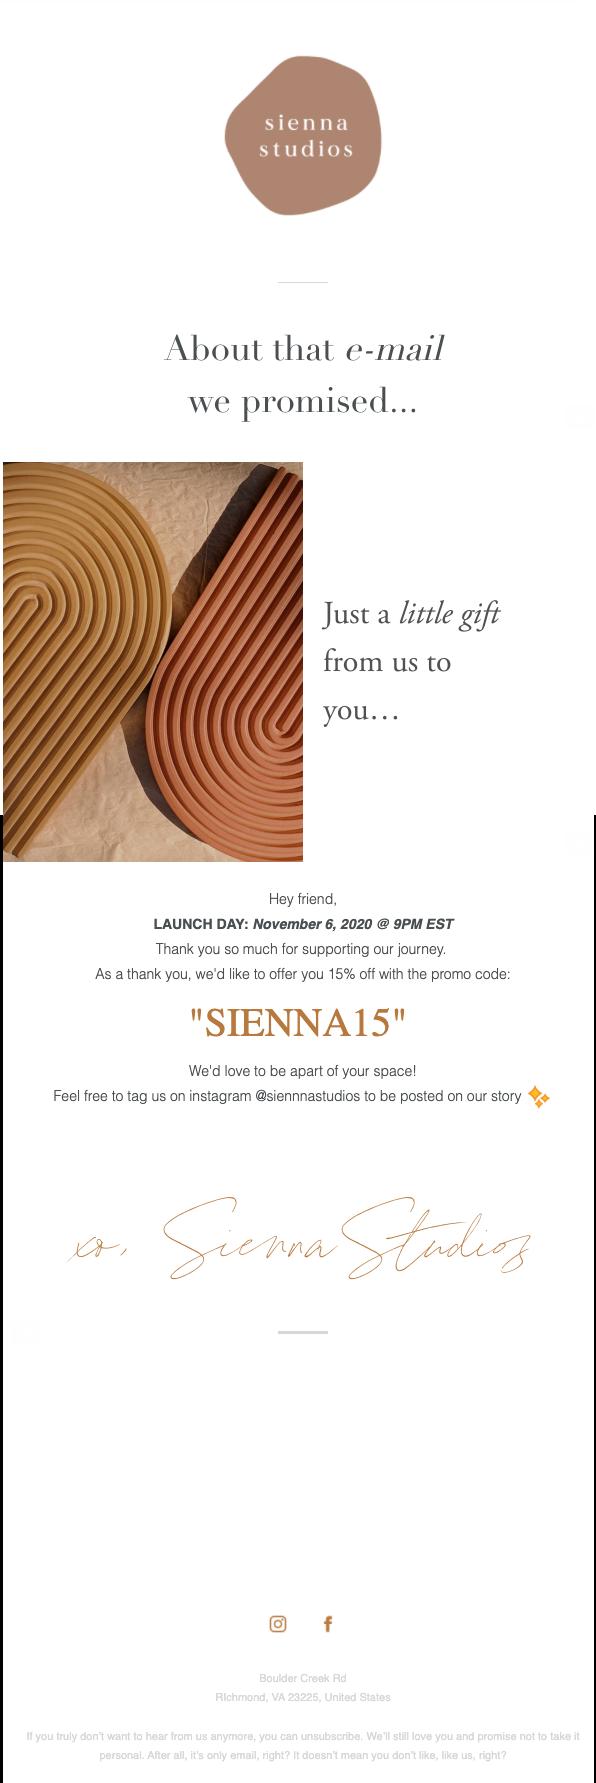 Sienna Studios